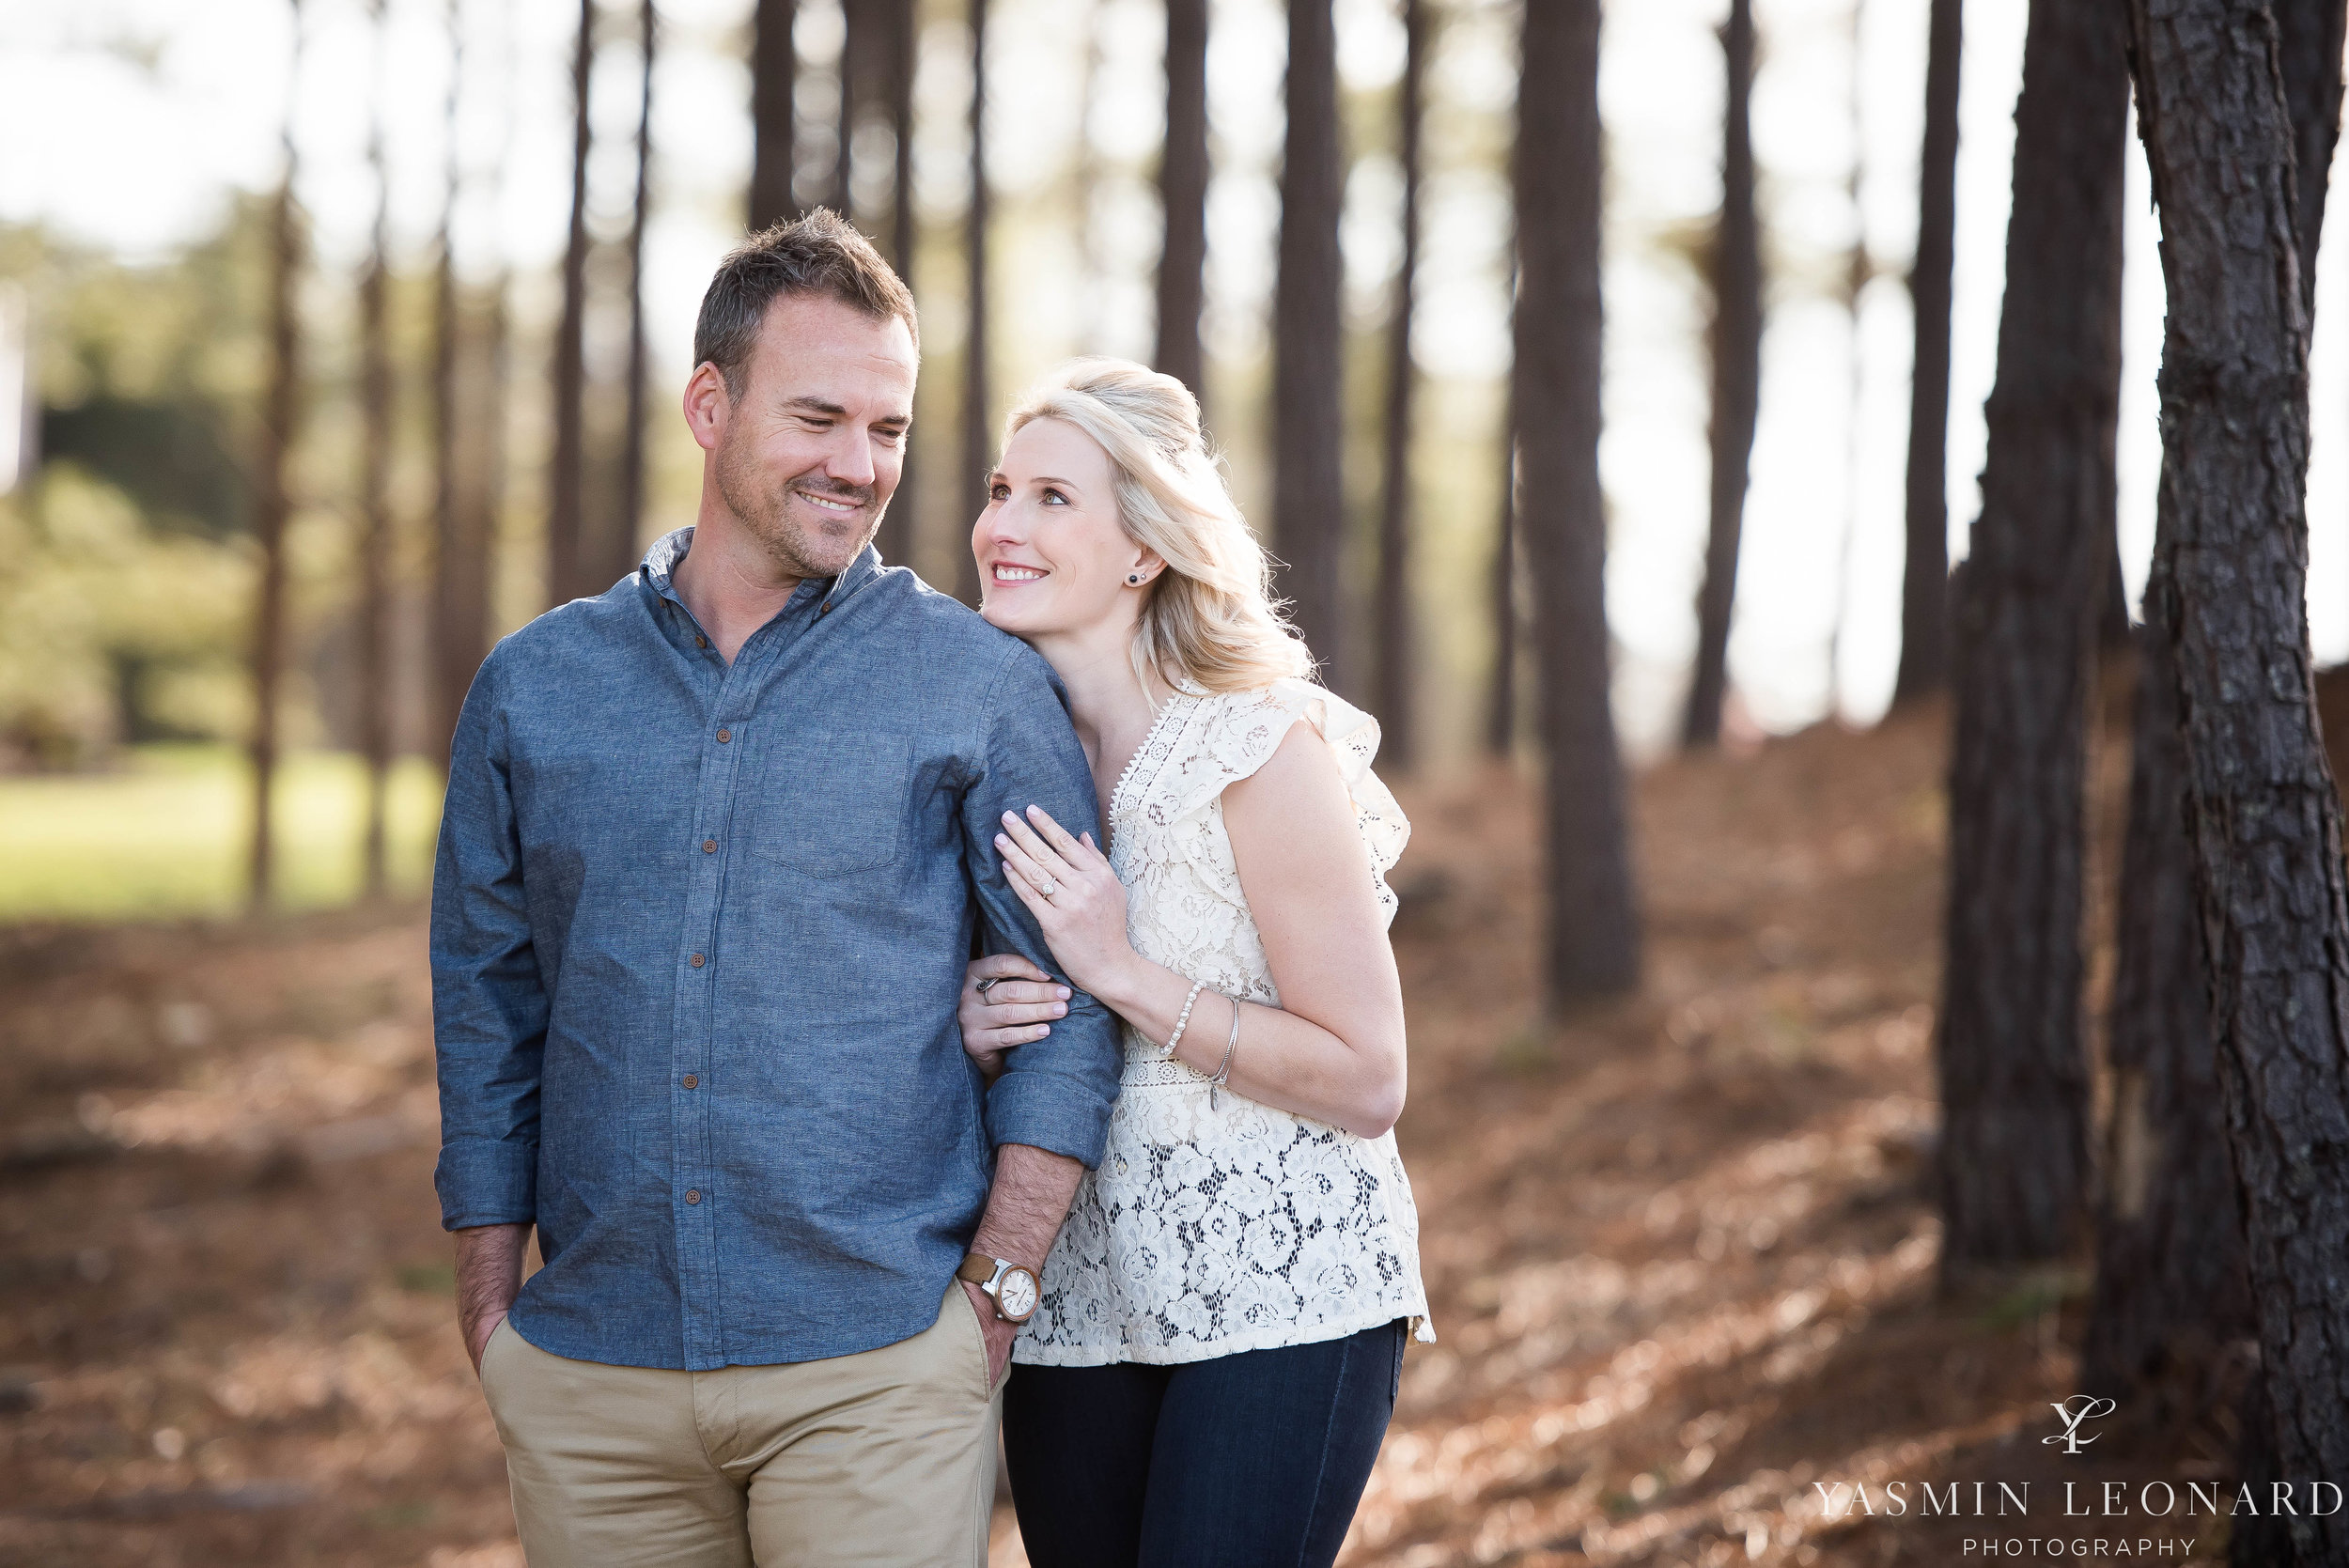 High Point Wedding Photographer - NC Wedding Photographer - Yasmin Leonard Photography - Engagement Poses - Engagement Ideas - Outdoor Engagement Session-9.jpg